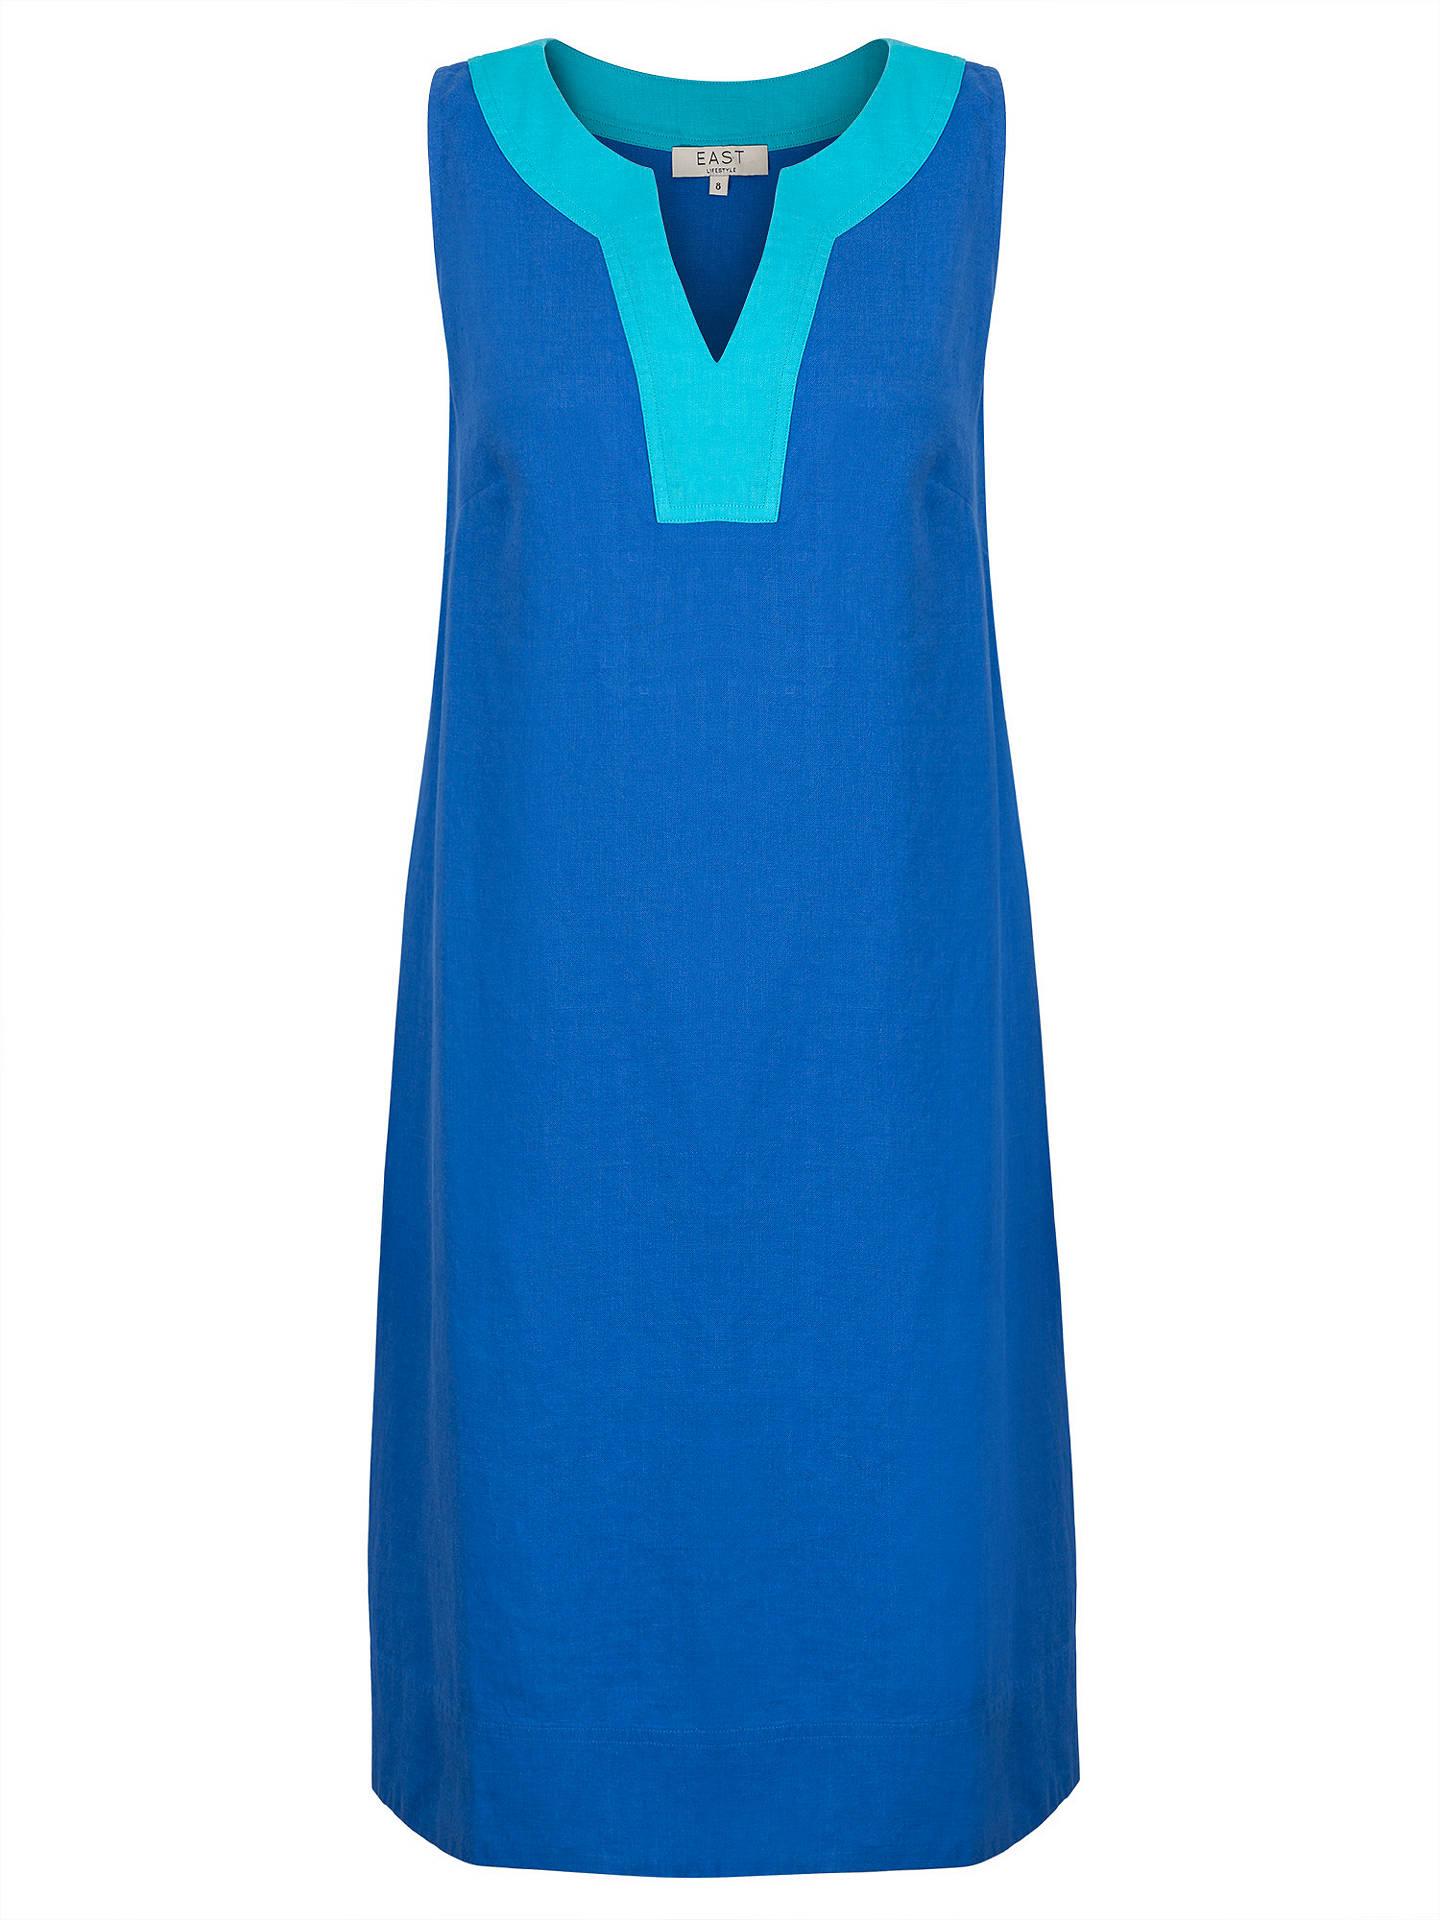 33ef8c8095 East Linen Notch Neck Dress at John Lewis   Partners